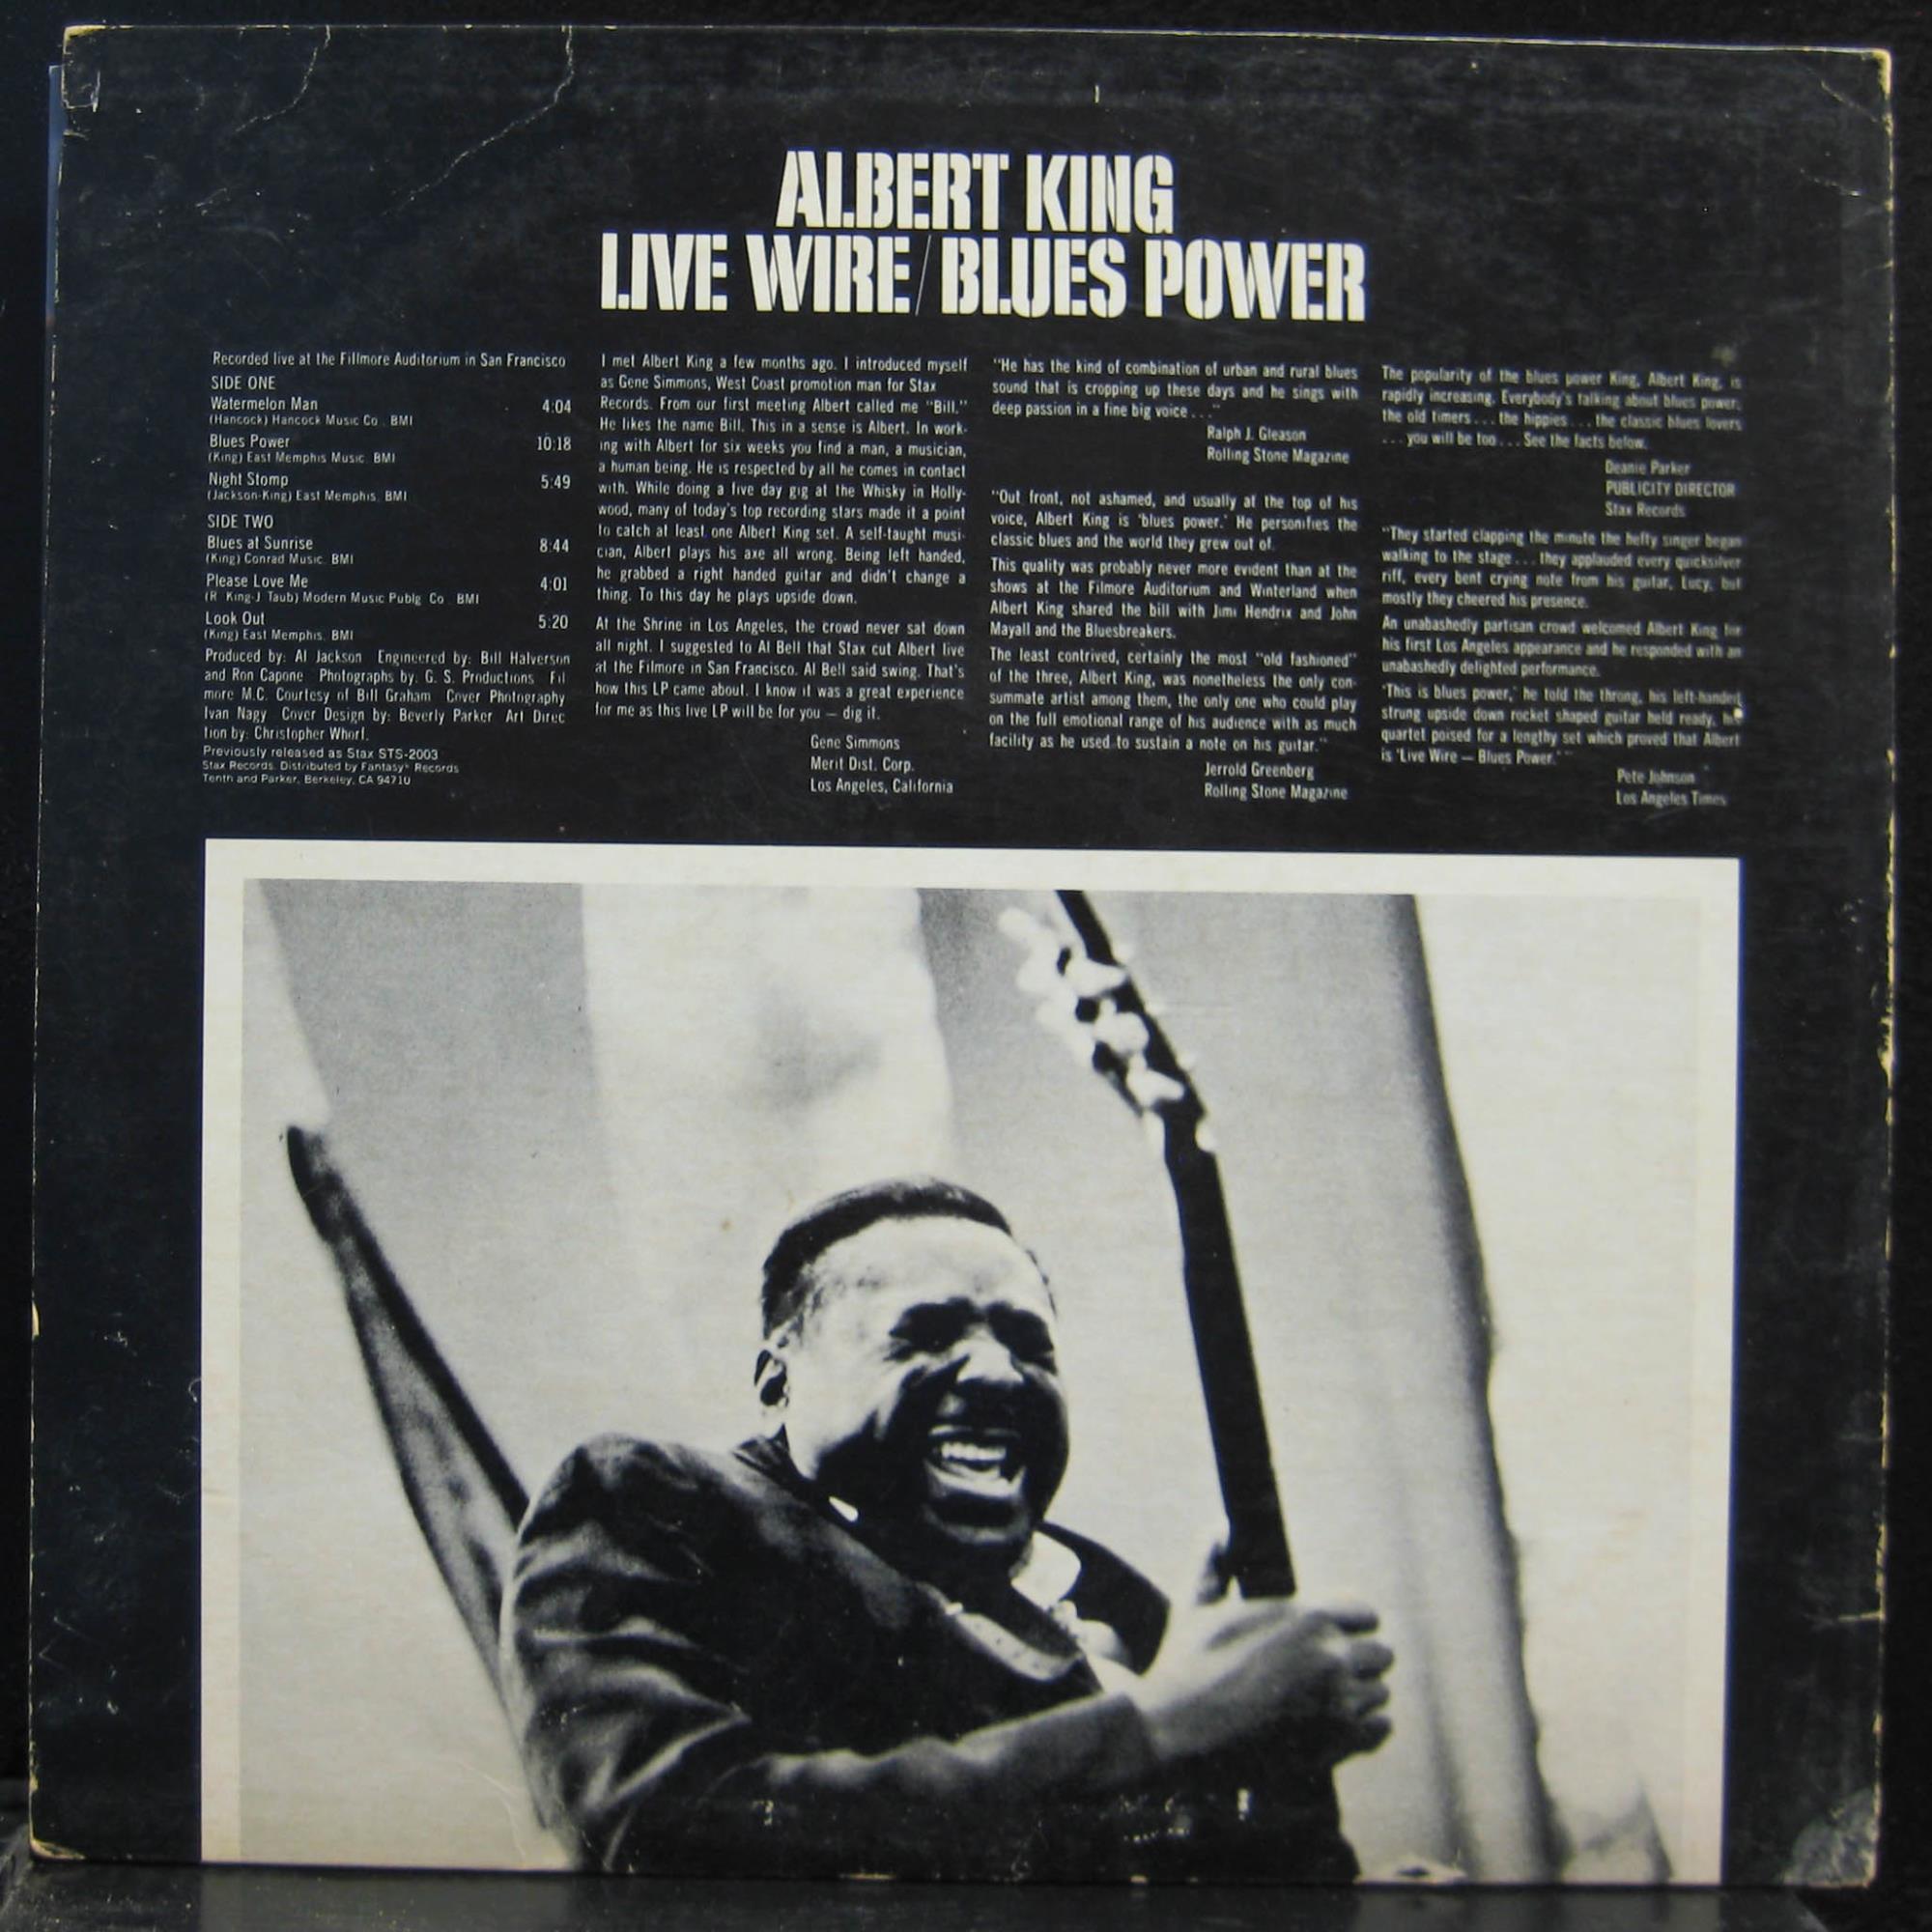 ALBERT KING live wire / blues power LP VG STX 4128 Vinyl 1968 ...